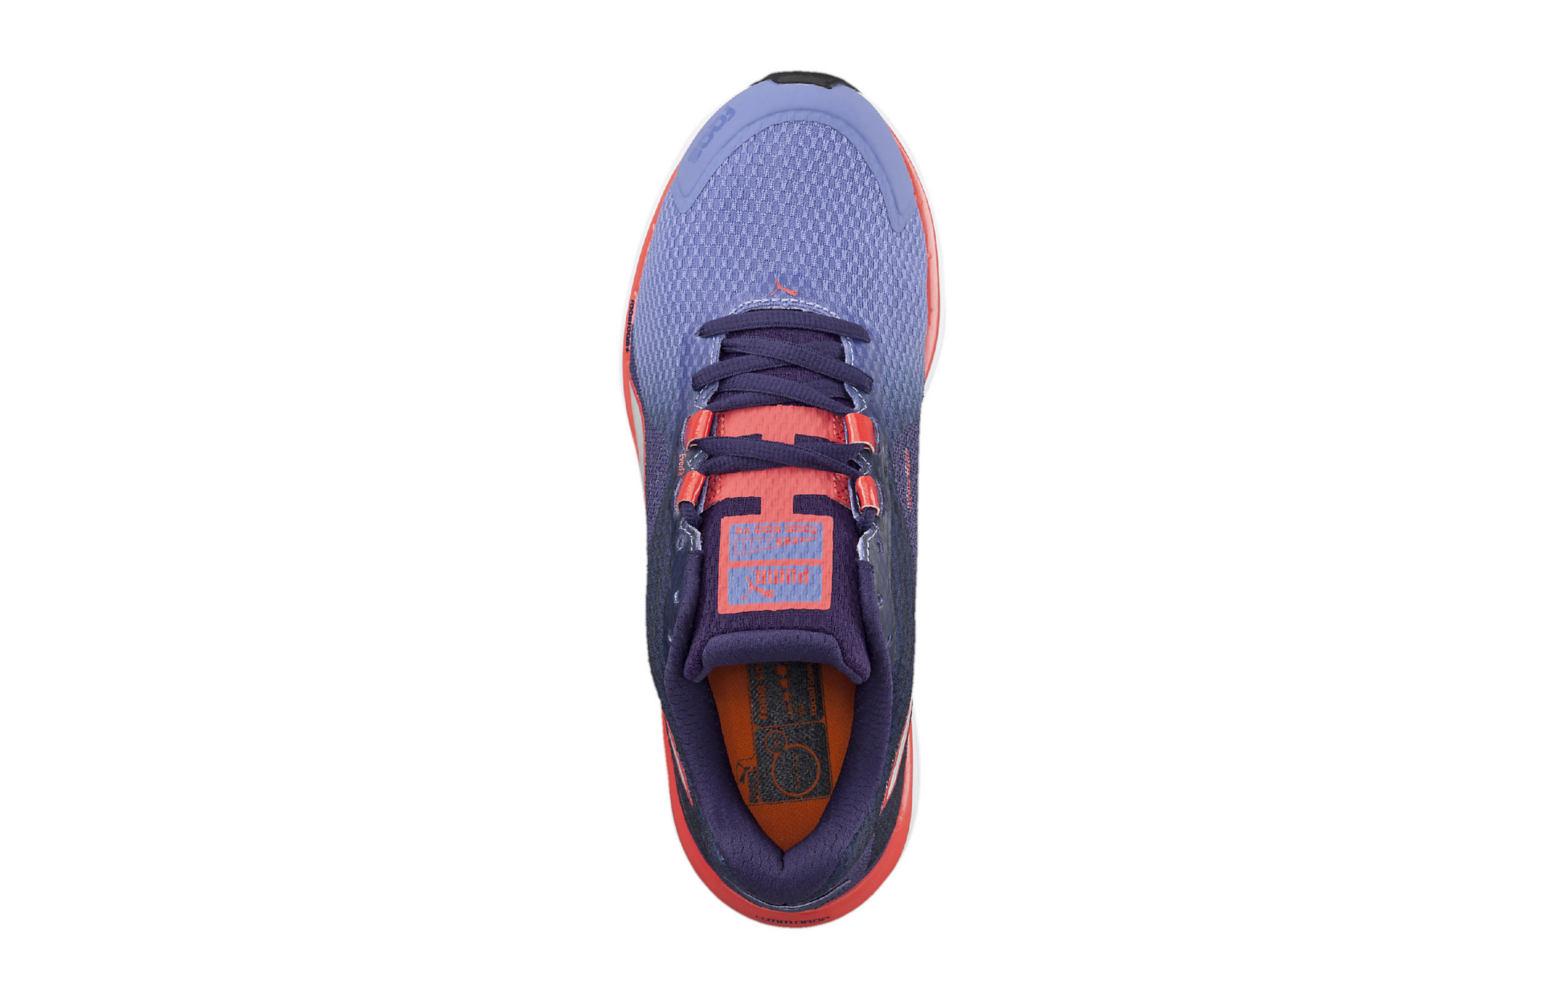 Violet 500 V4 Running Faas Femme Chaussures Puma De a8w7fU0q